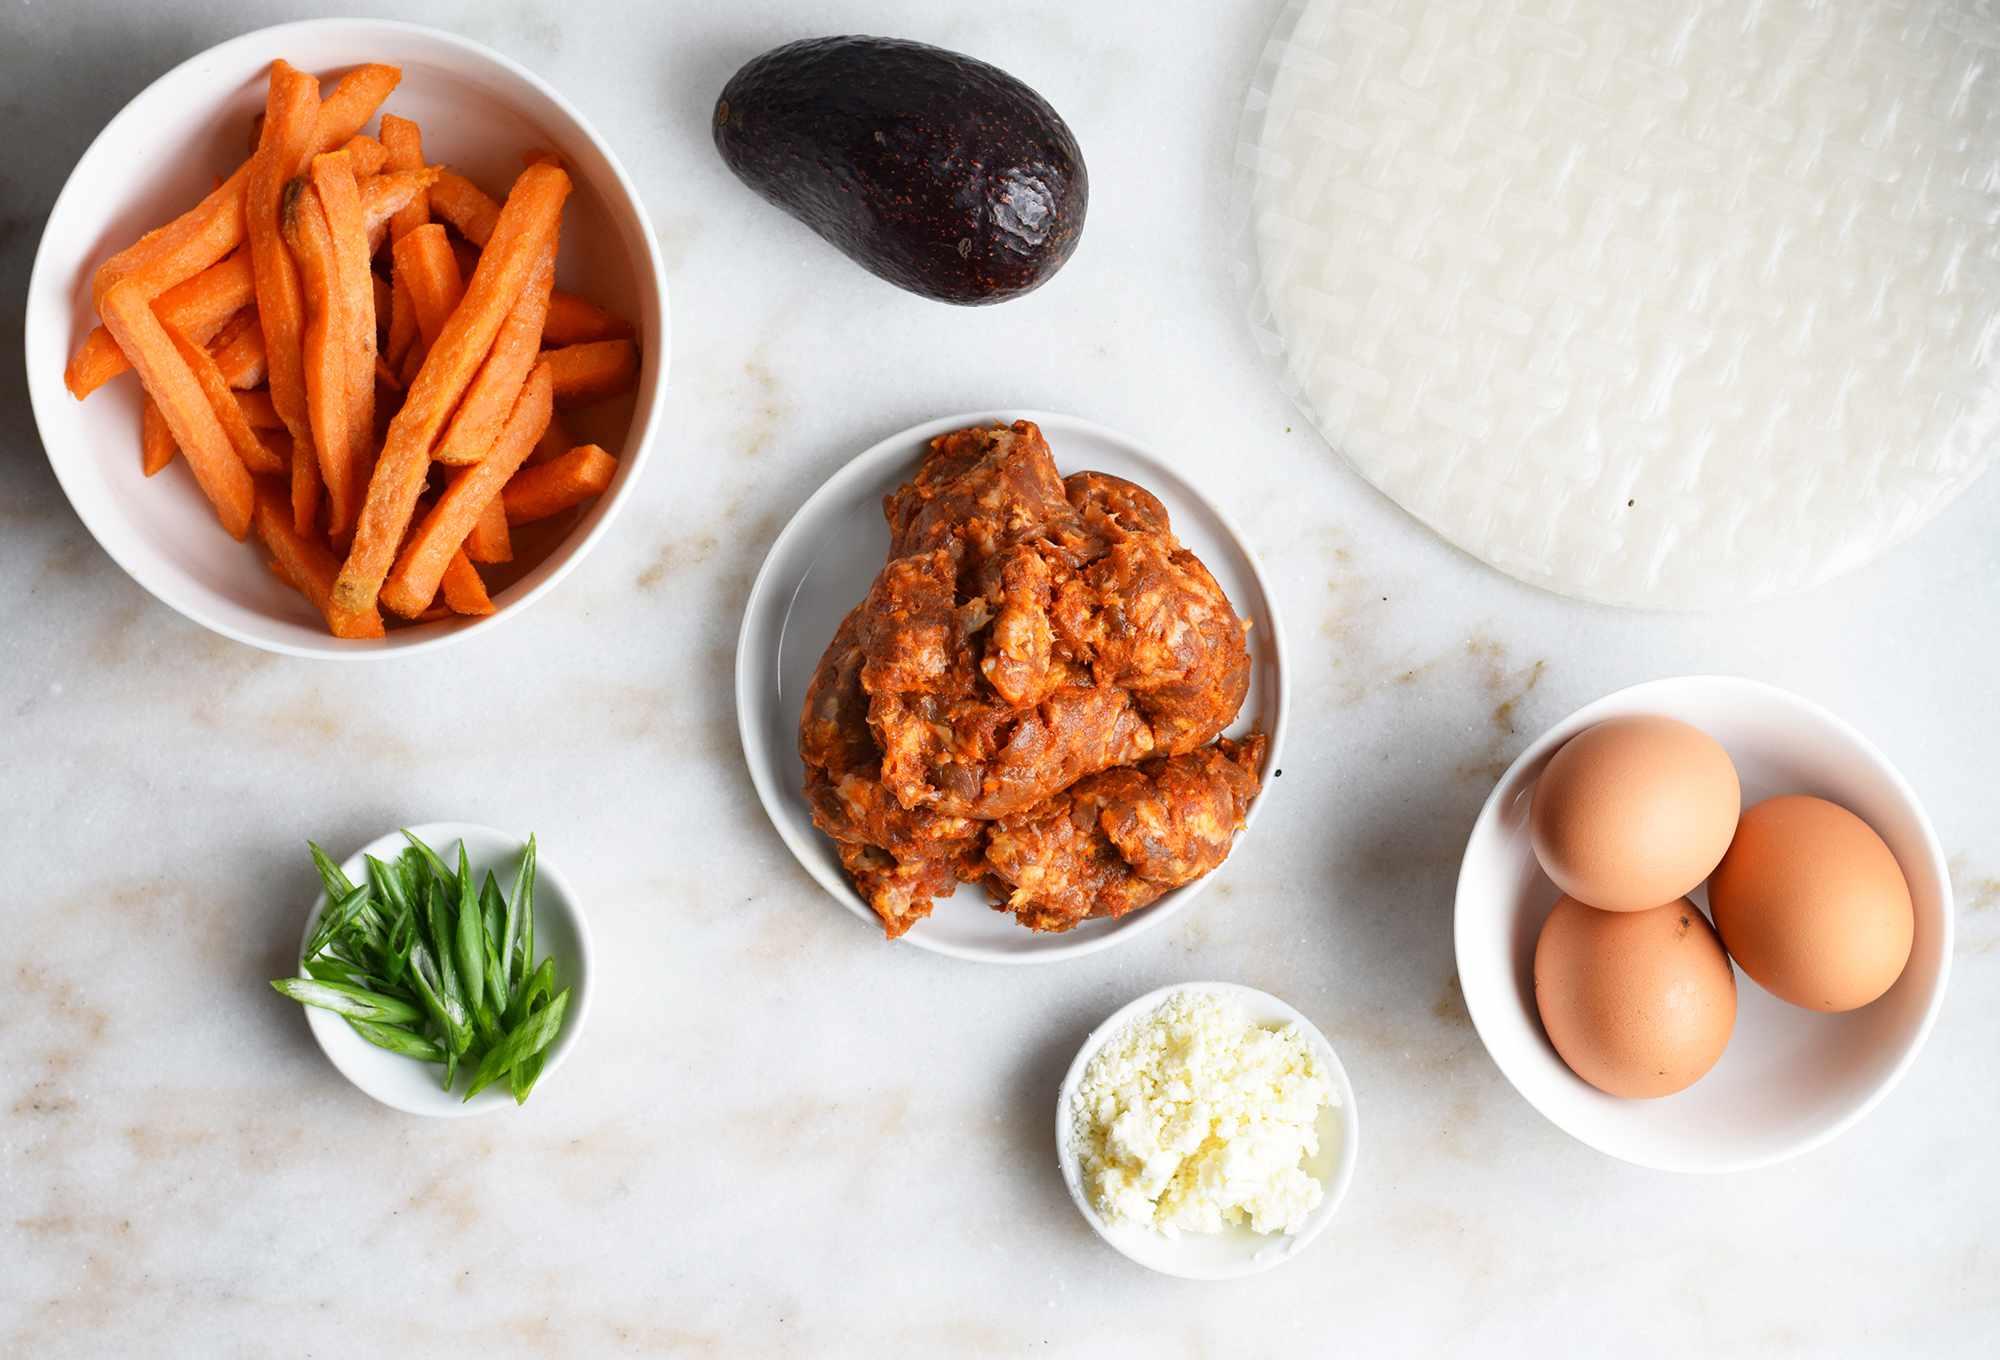 savory breakfast summer roll ingredients on marble board